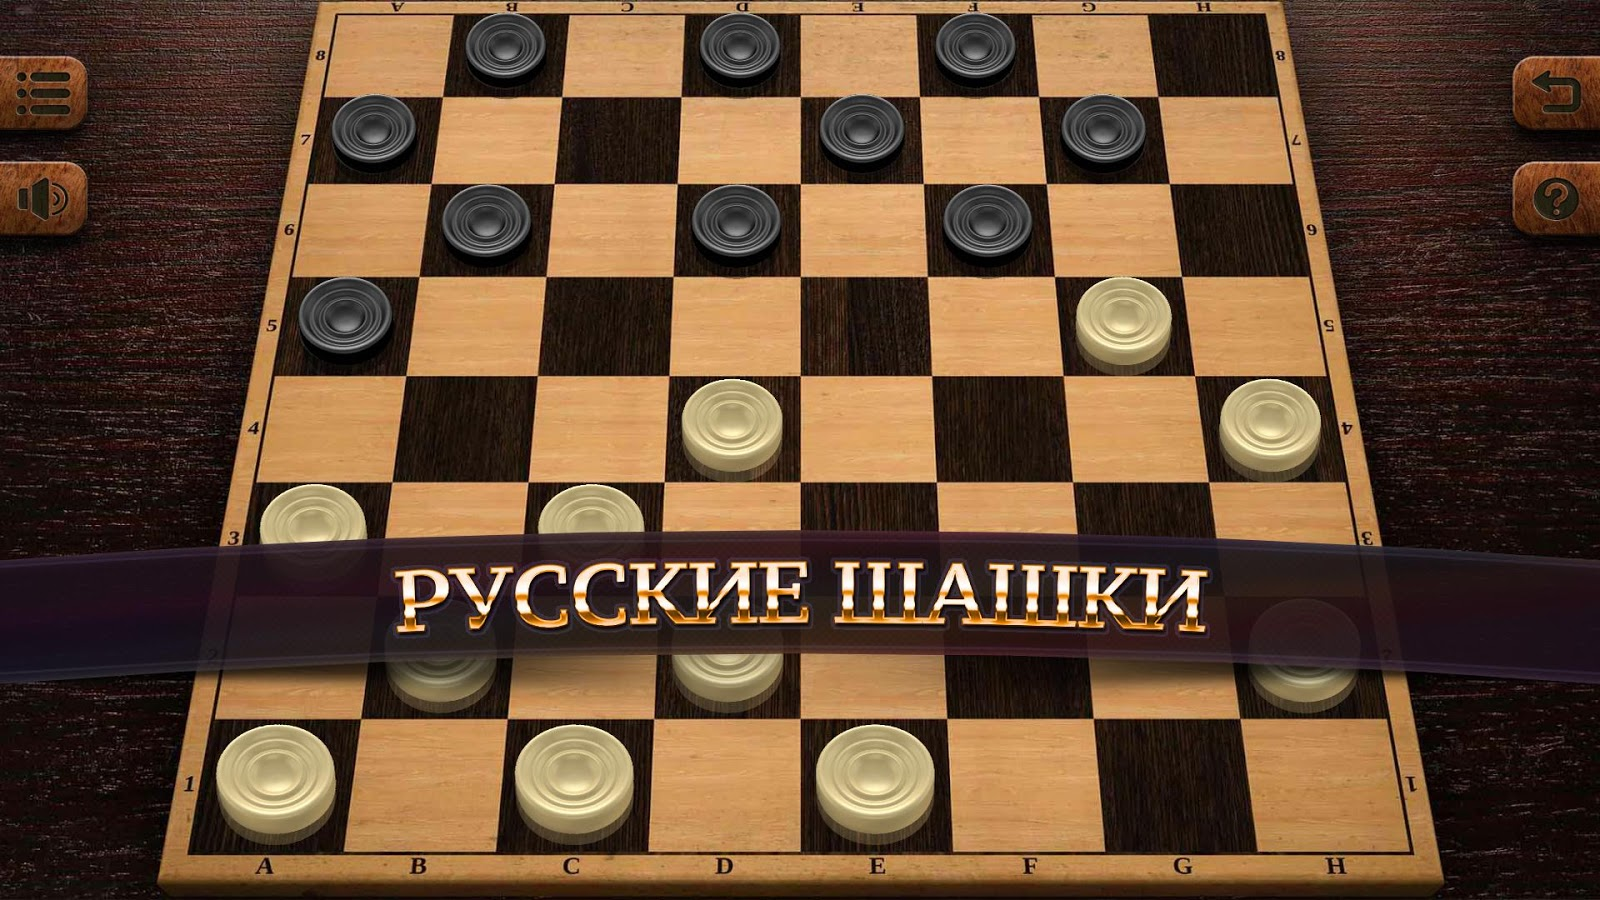 Русские шашки на двоих for android apk download.